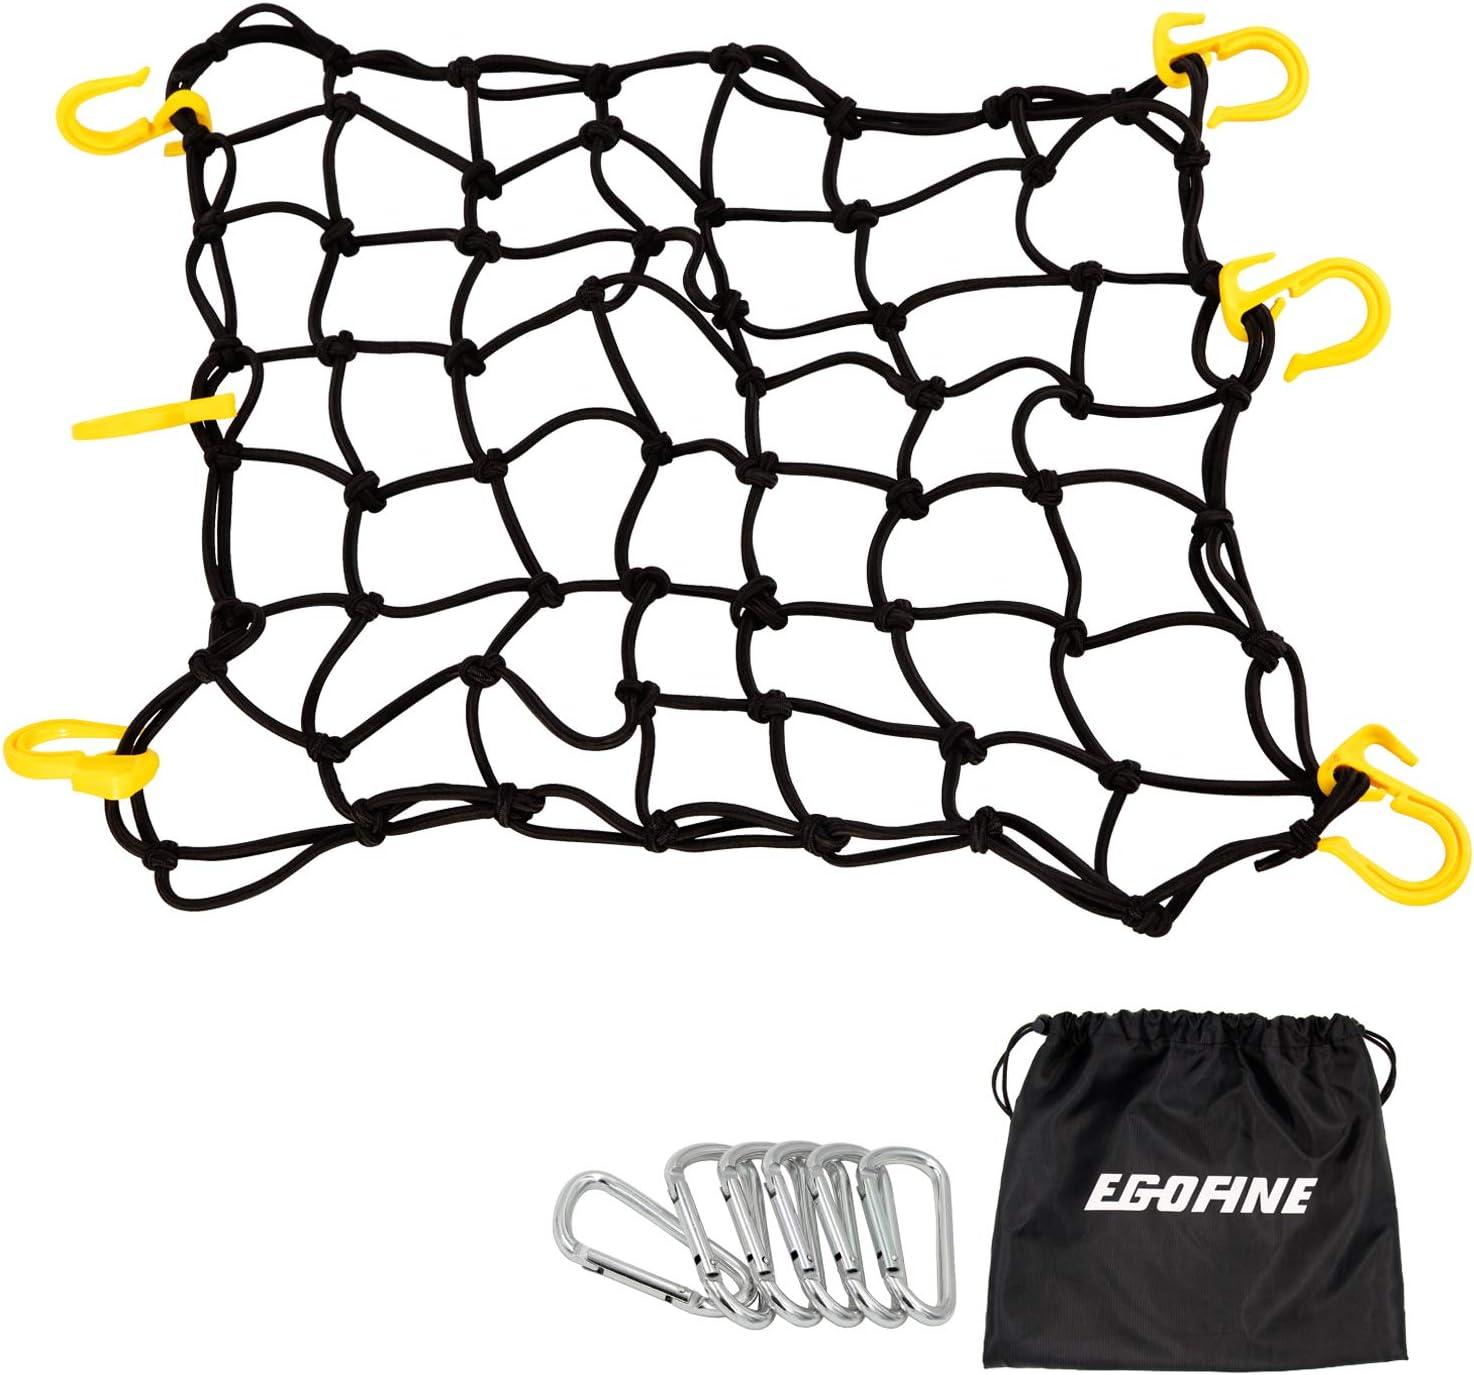 Egofine Motorcycle Cargo Net